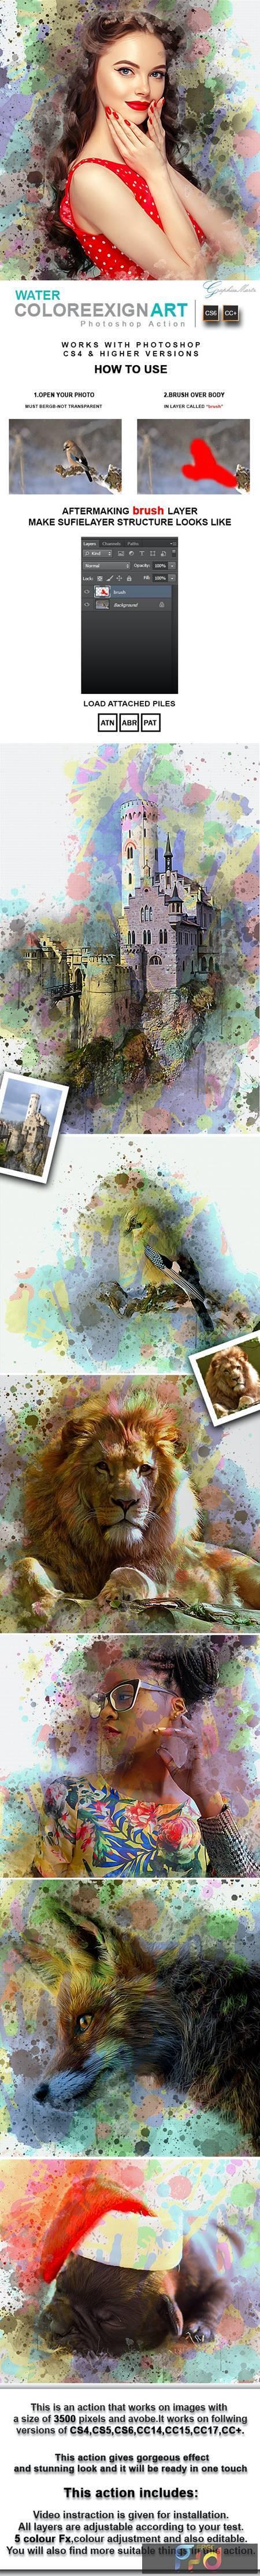 Water ColoreeXign Art Photoshop Action 28337654 1